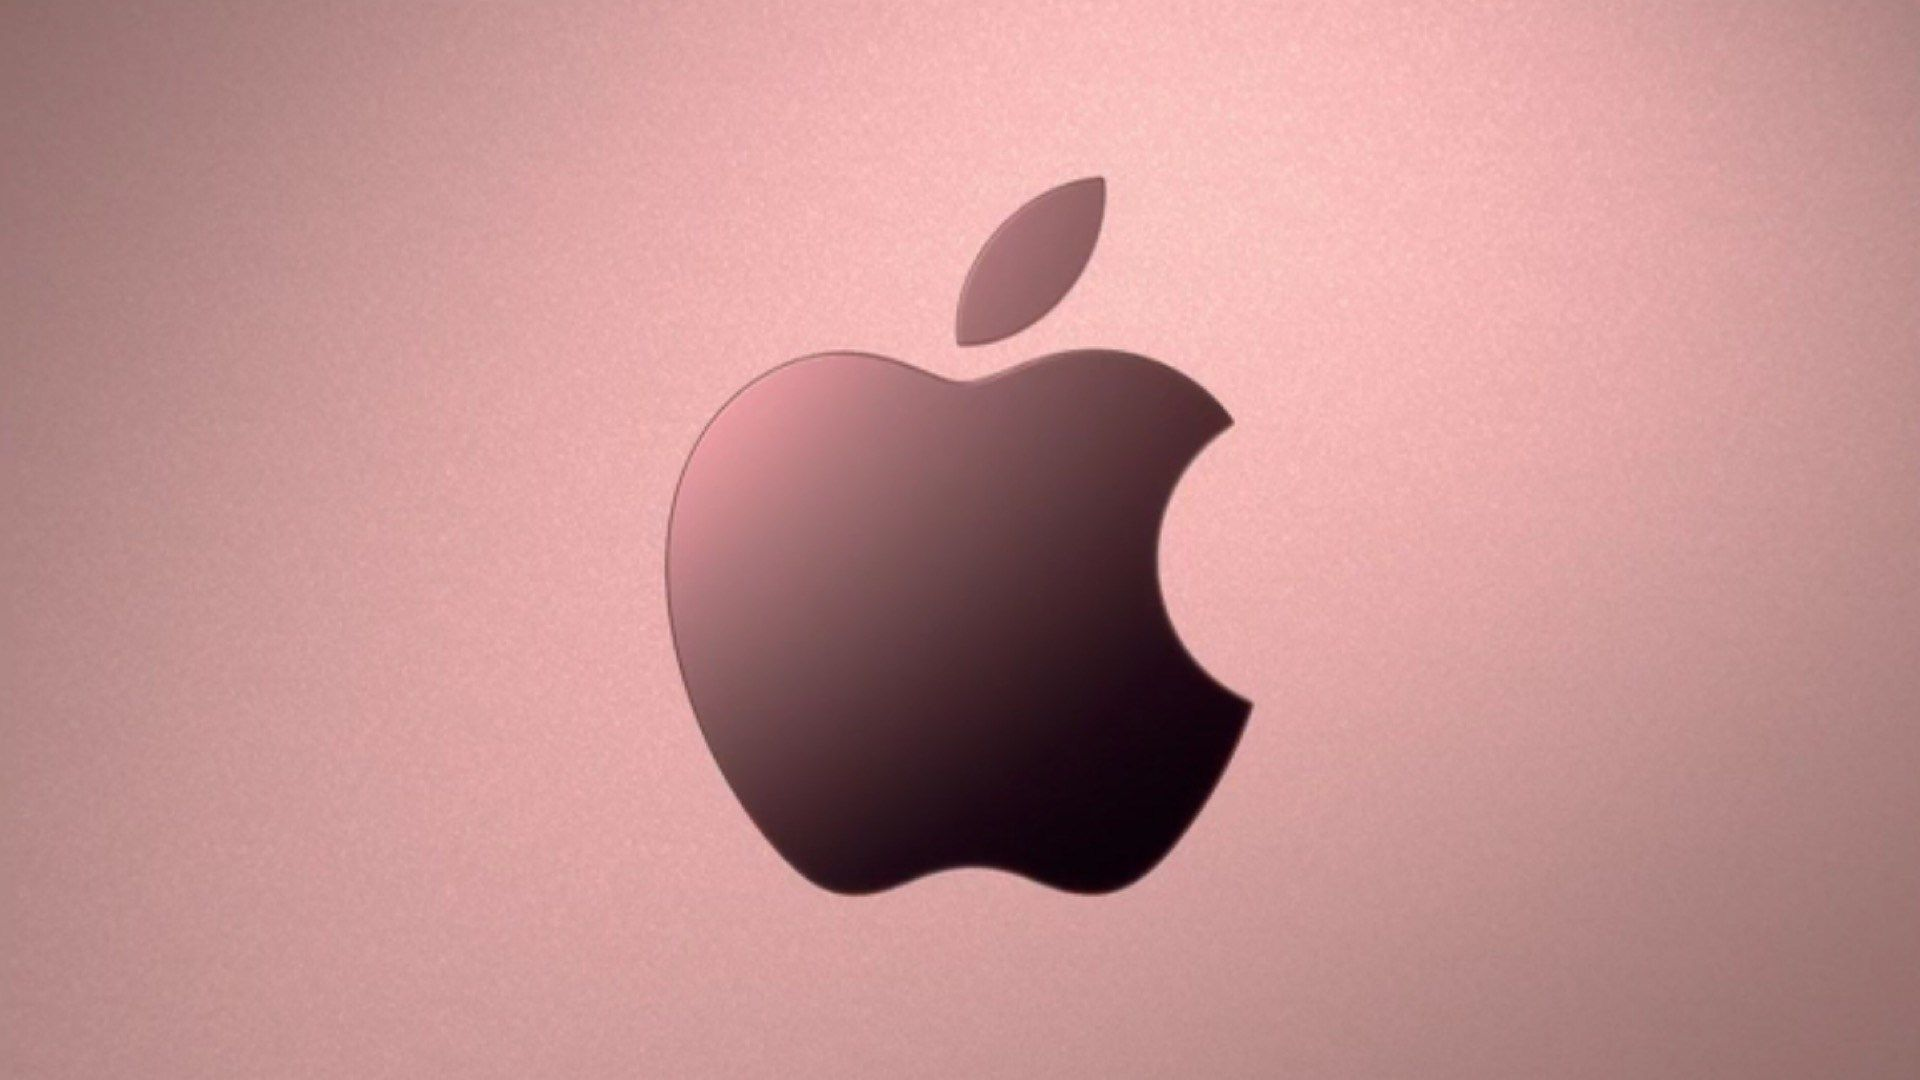 Картинка эпл яблоко без фона